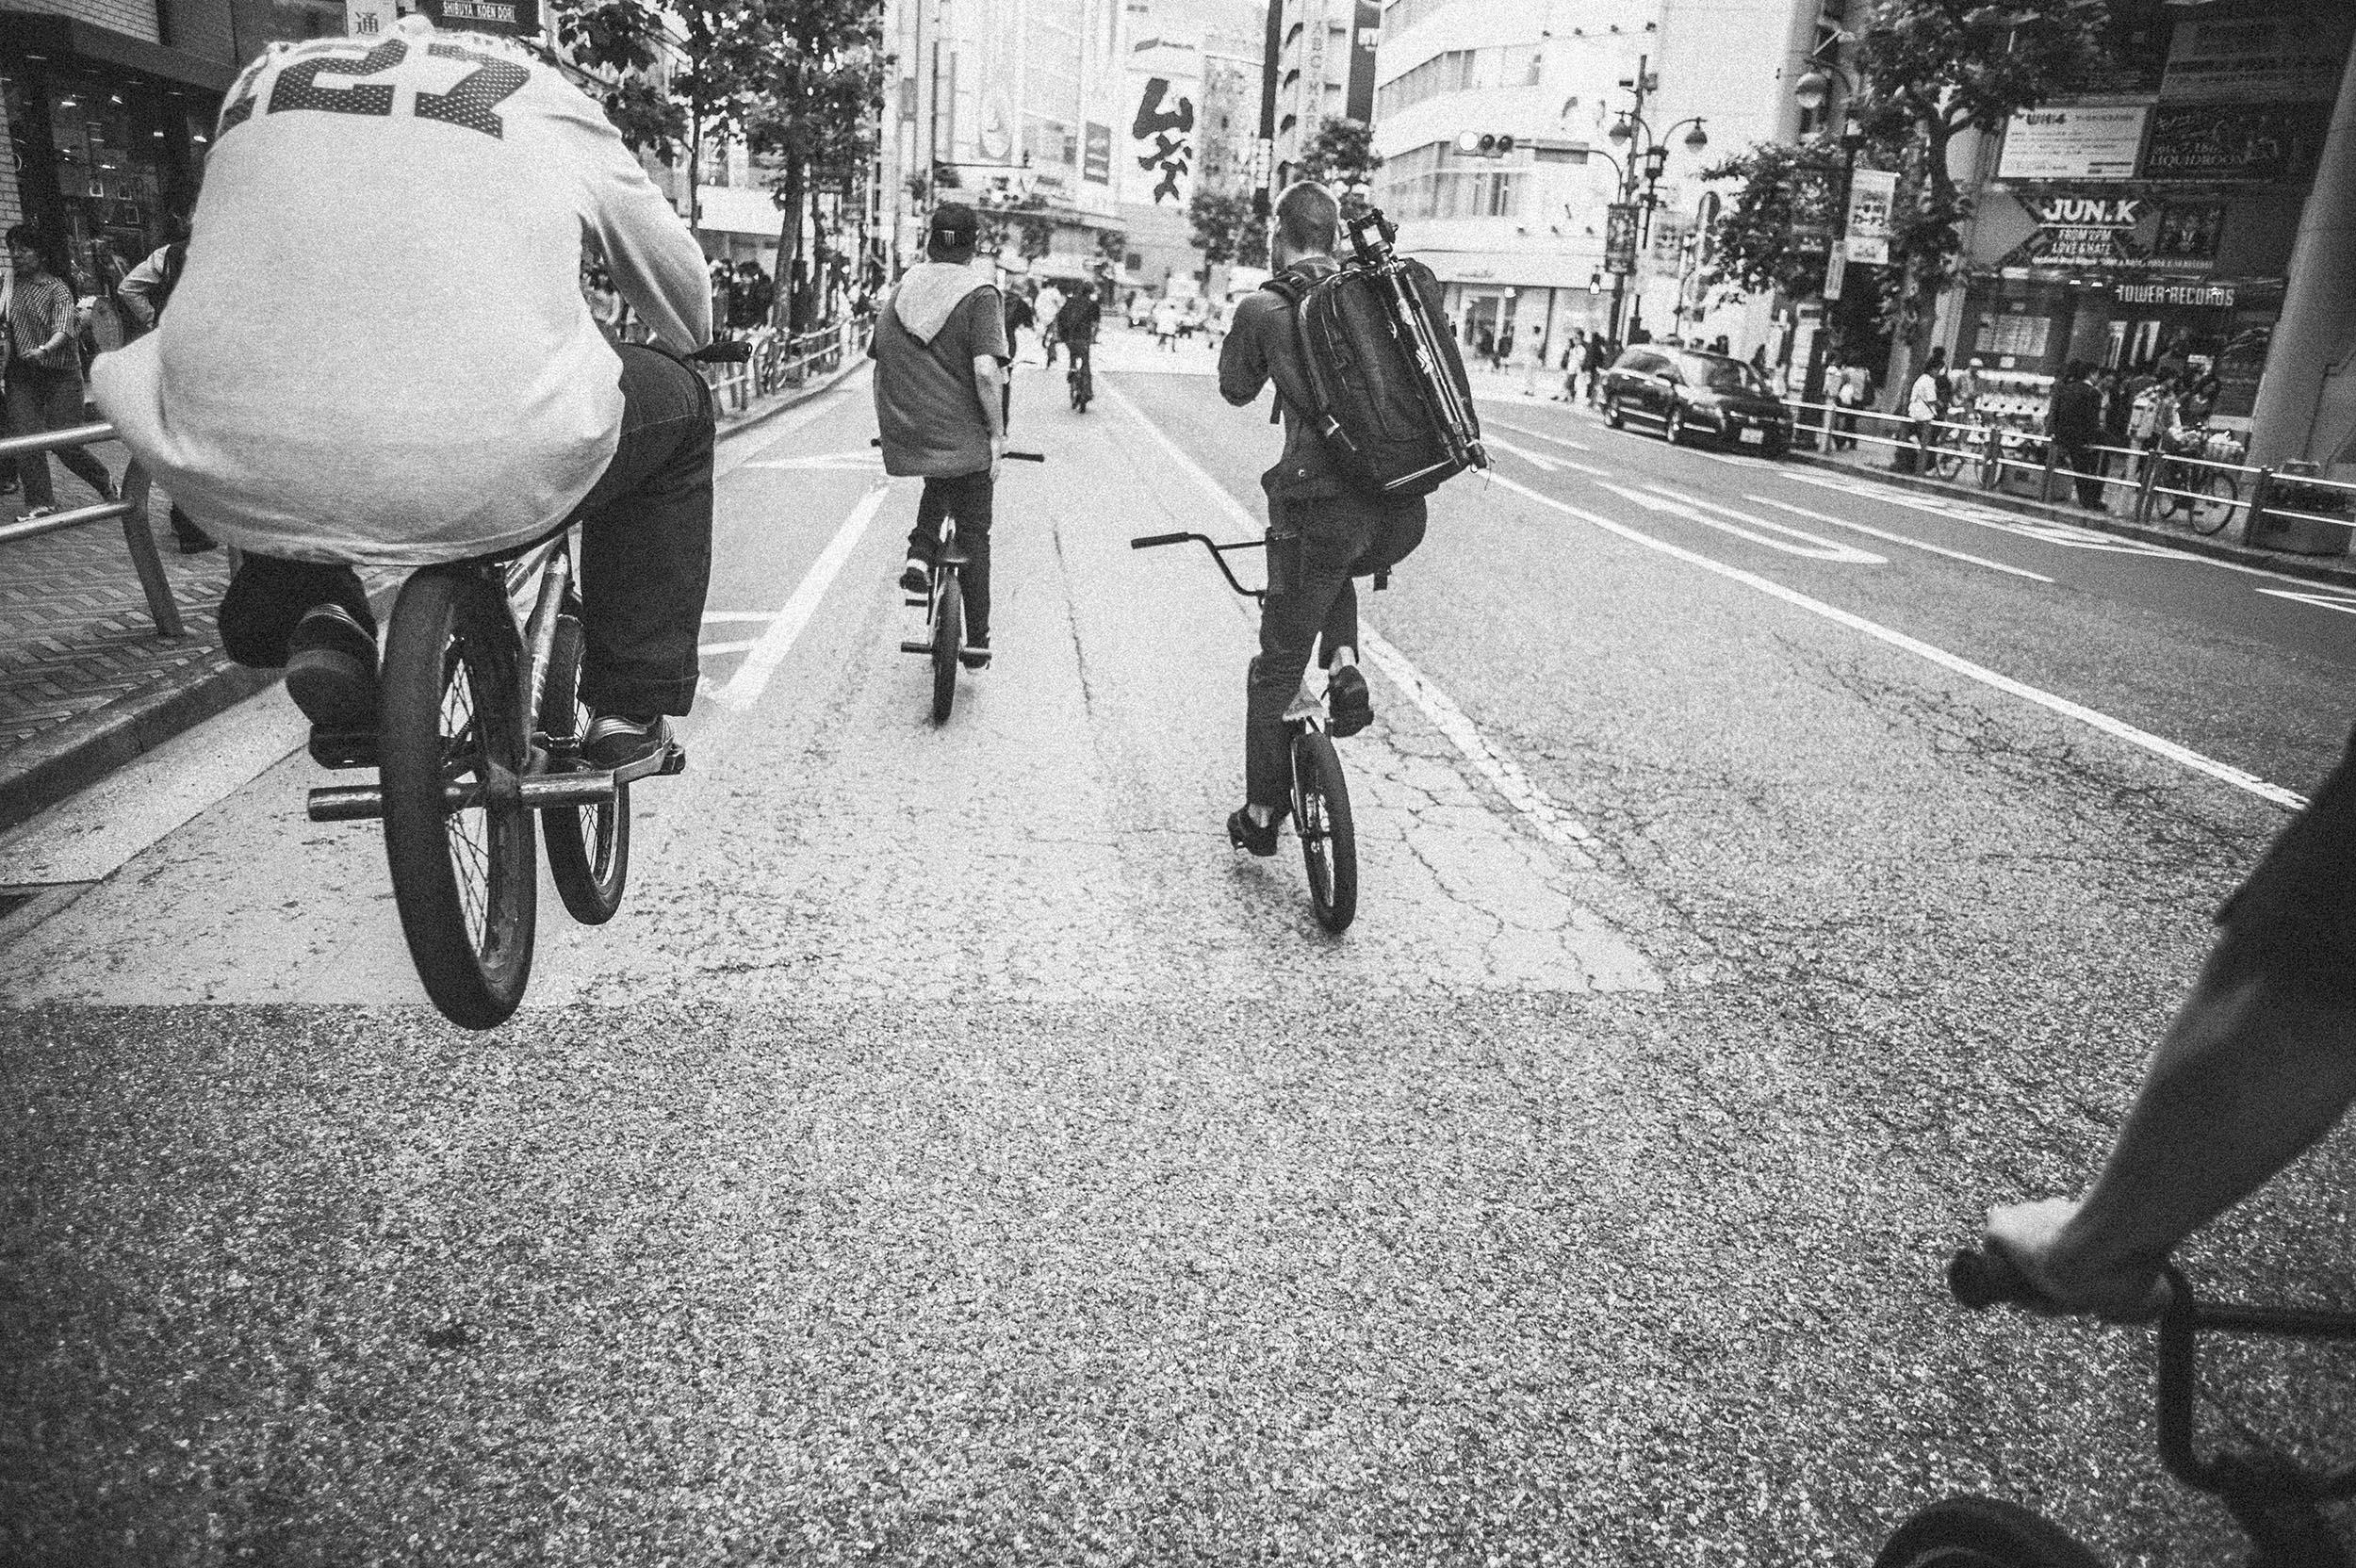 Jay Bean for DIG BMX - Tokyo, Japan